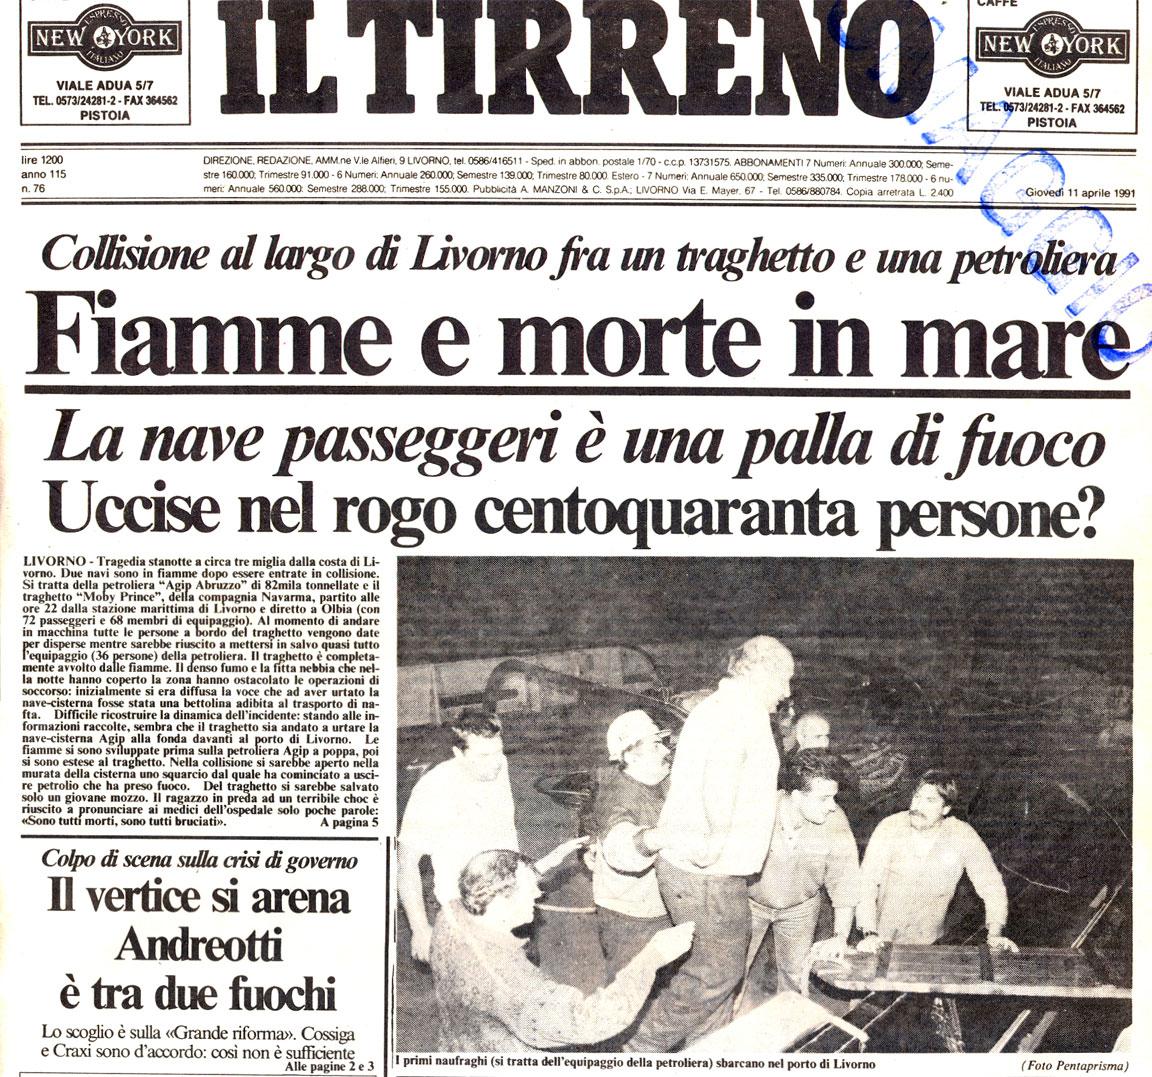 Il Tirreno - disastro Moby Prince